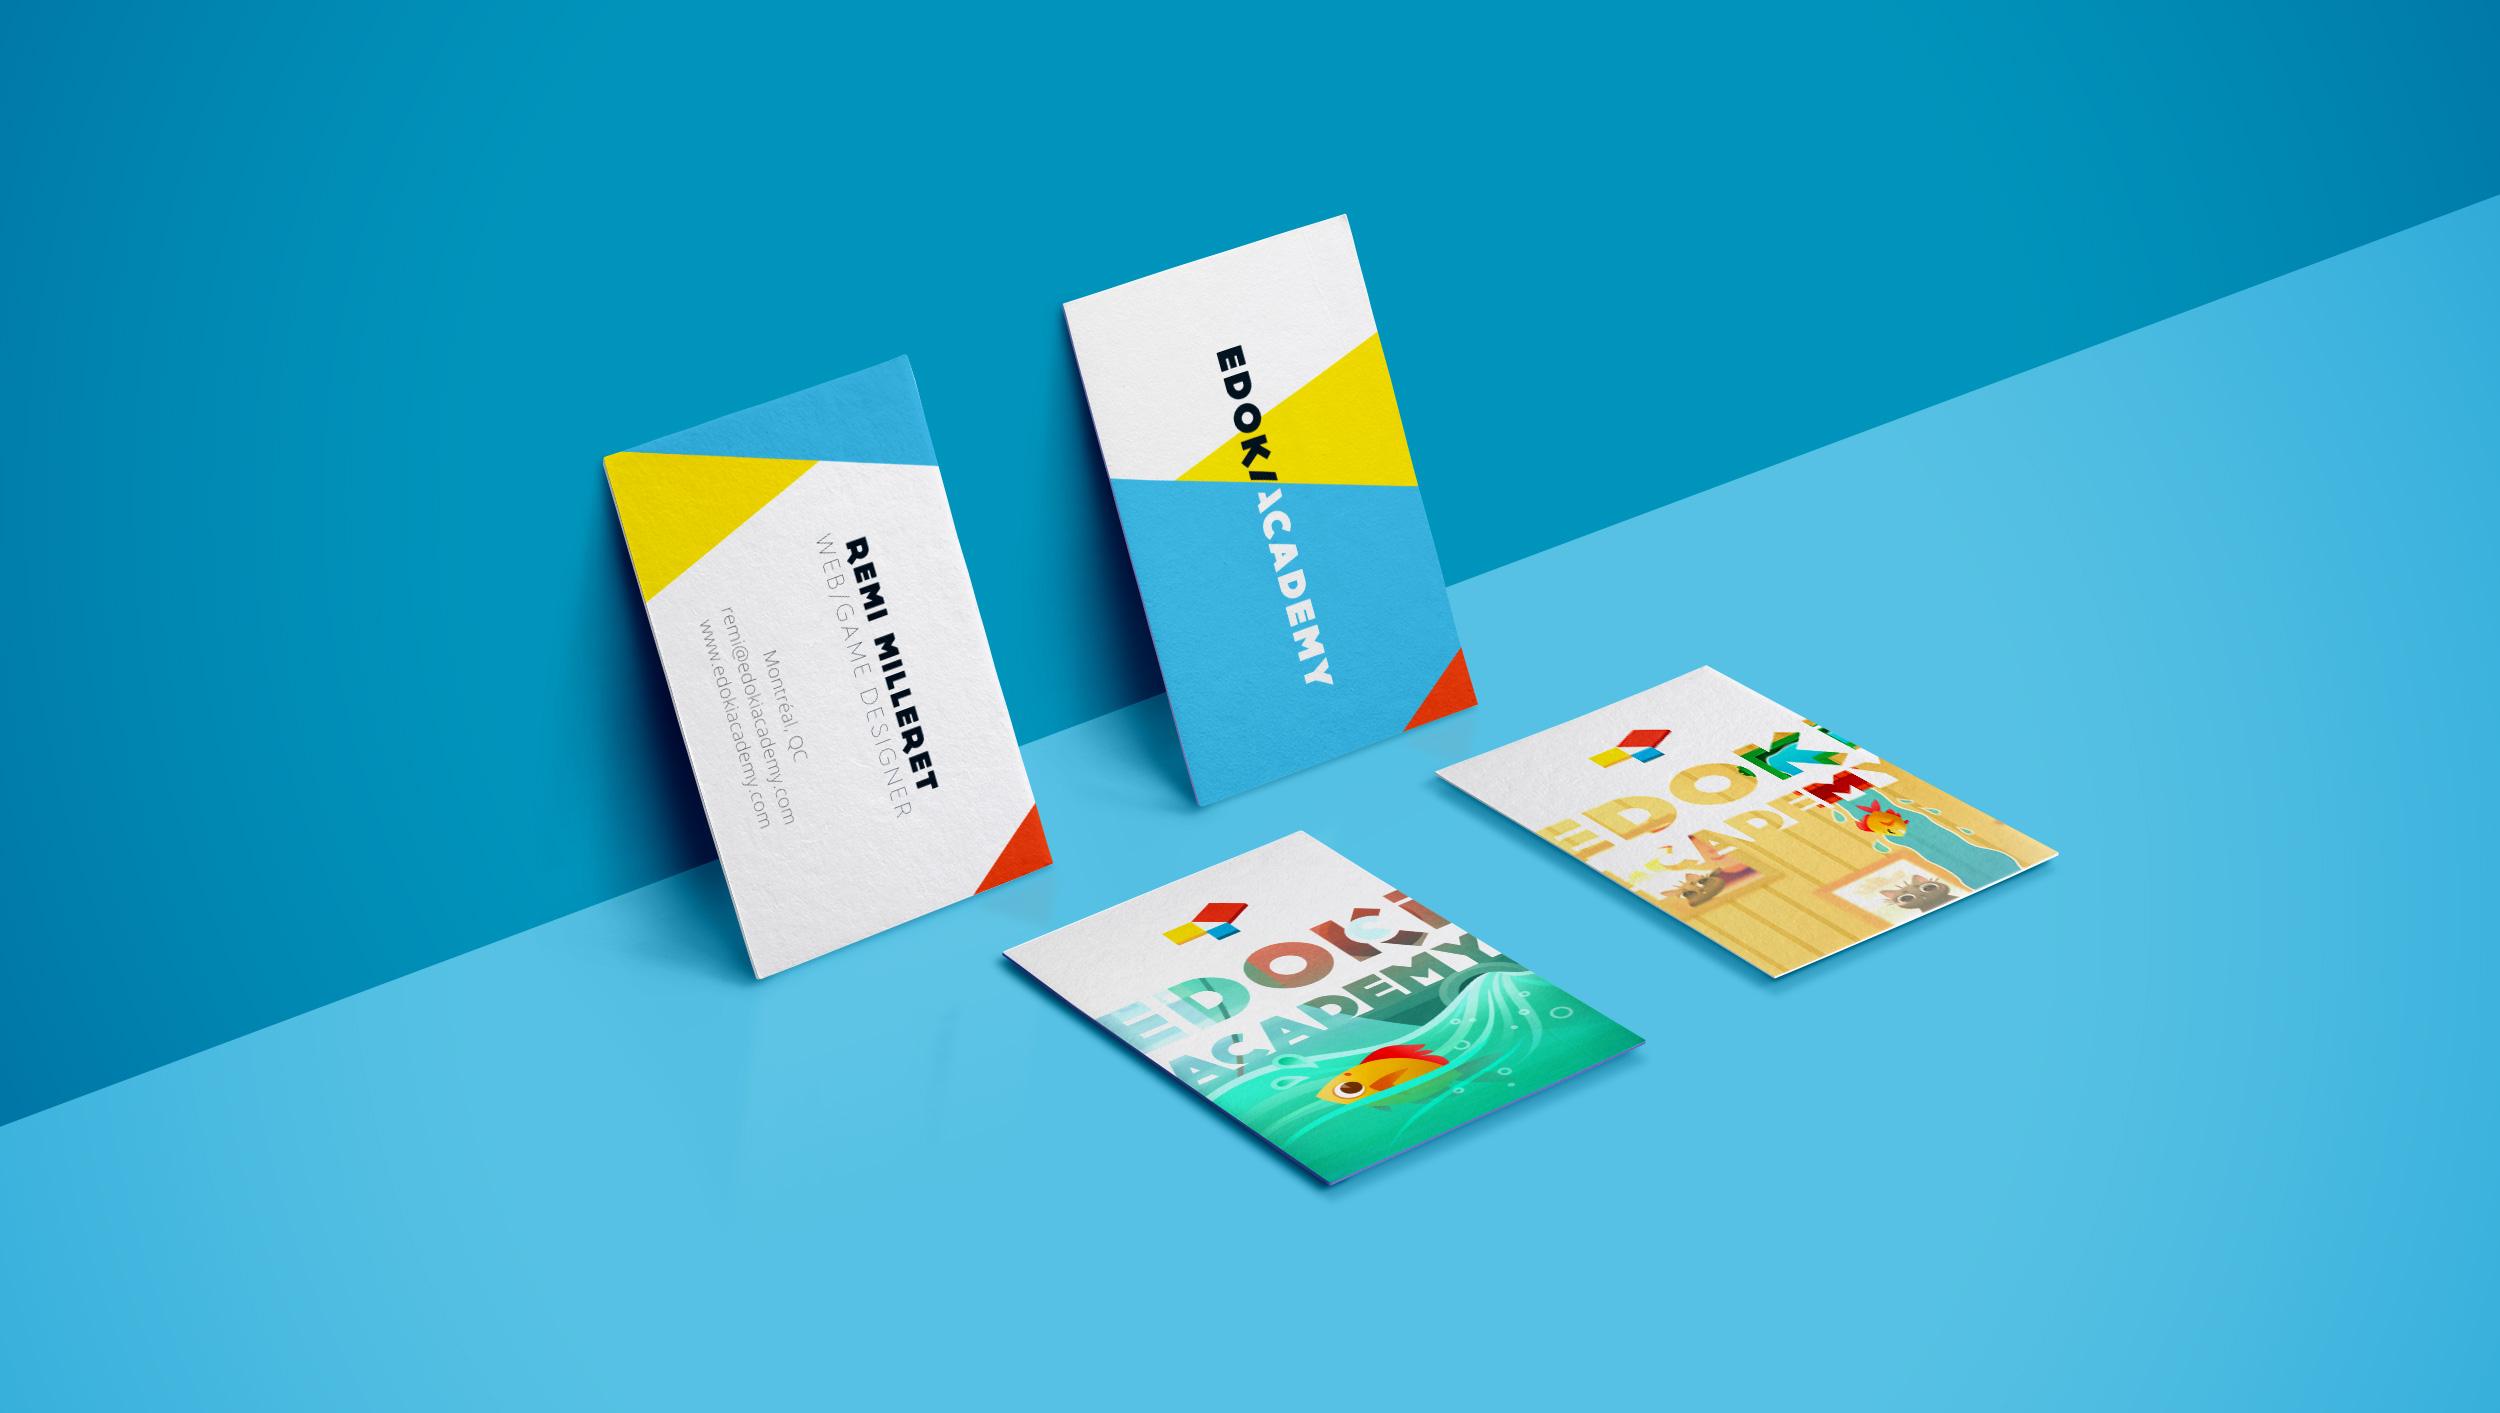 Branding Apps Company - EDOKI ACADEMY - Millimade